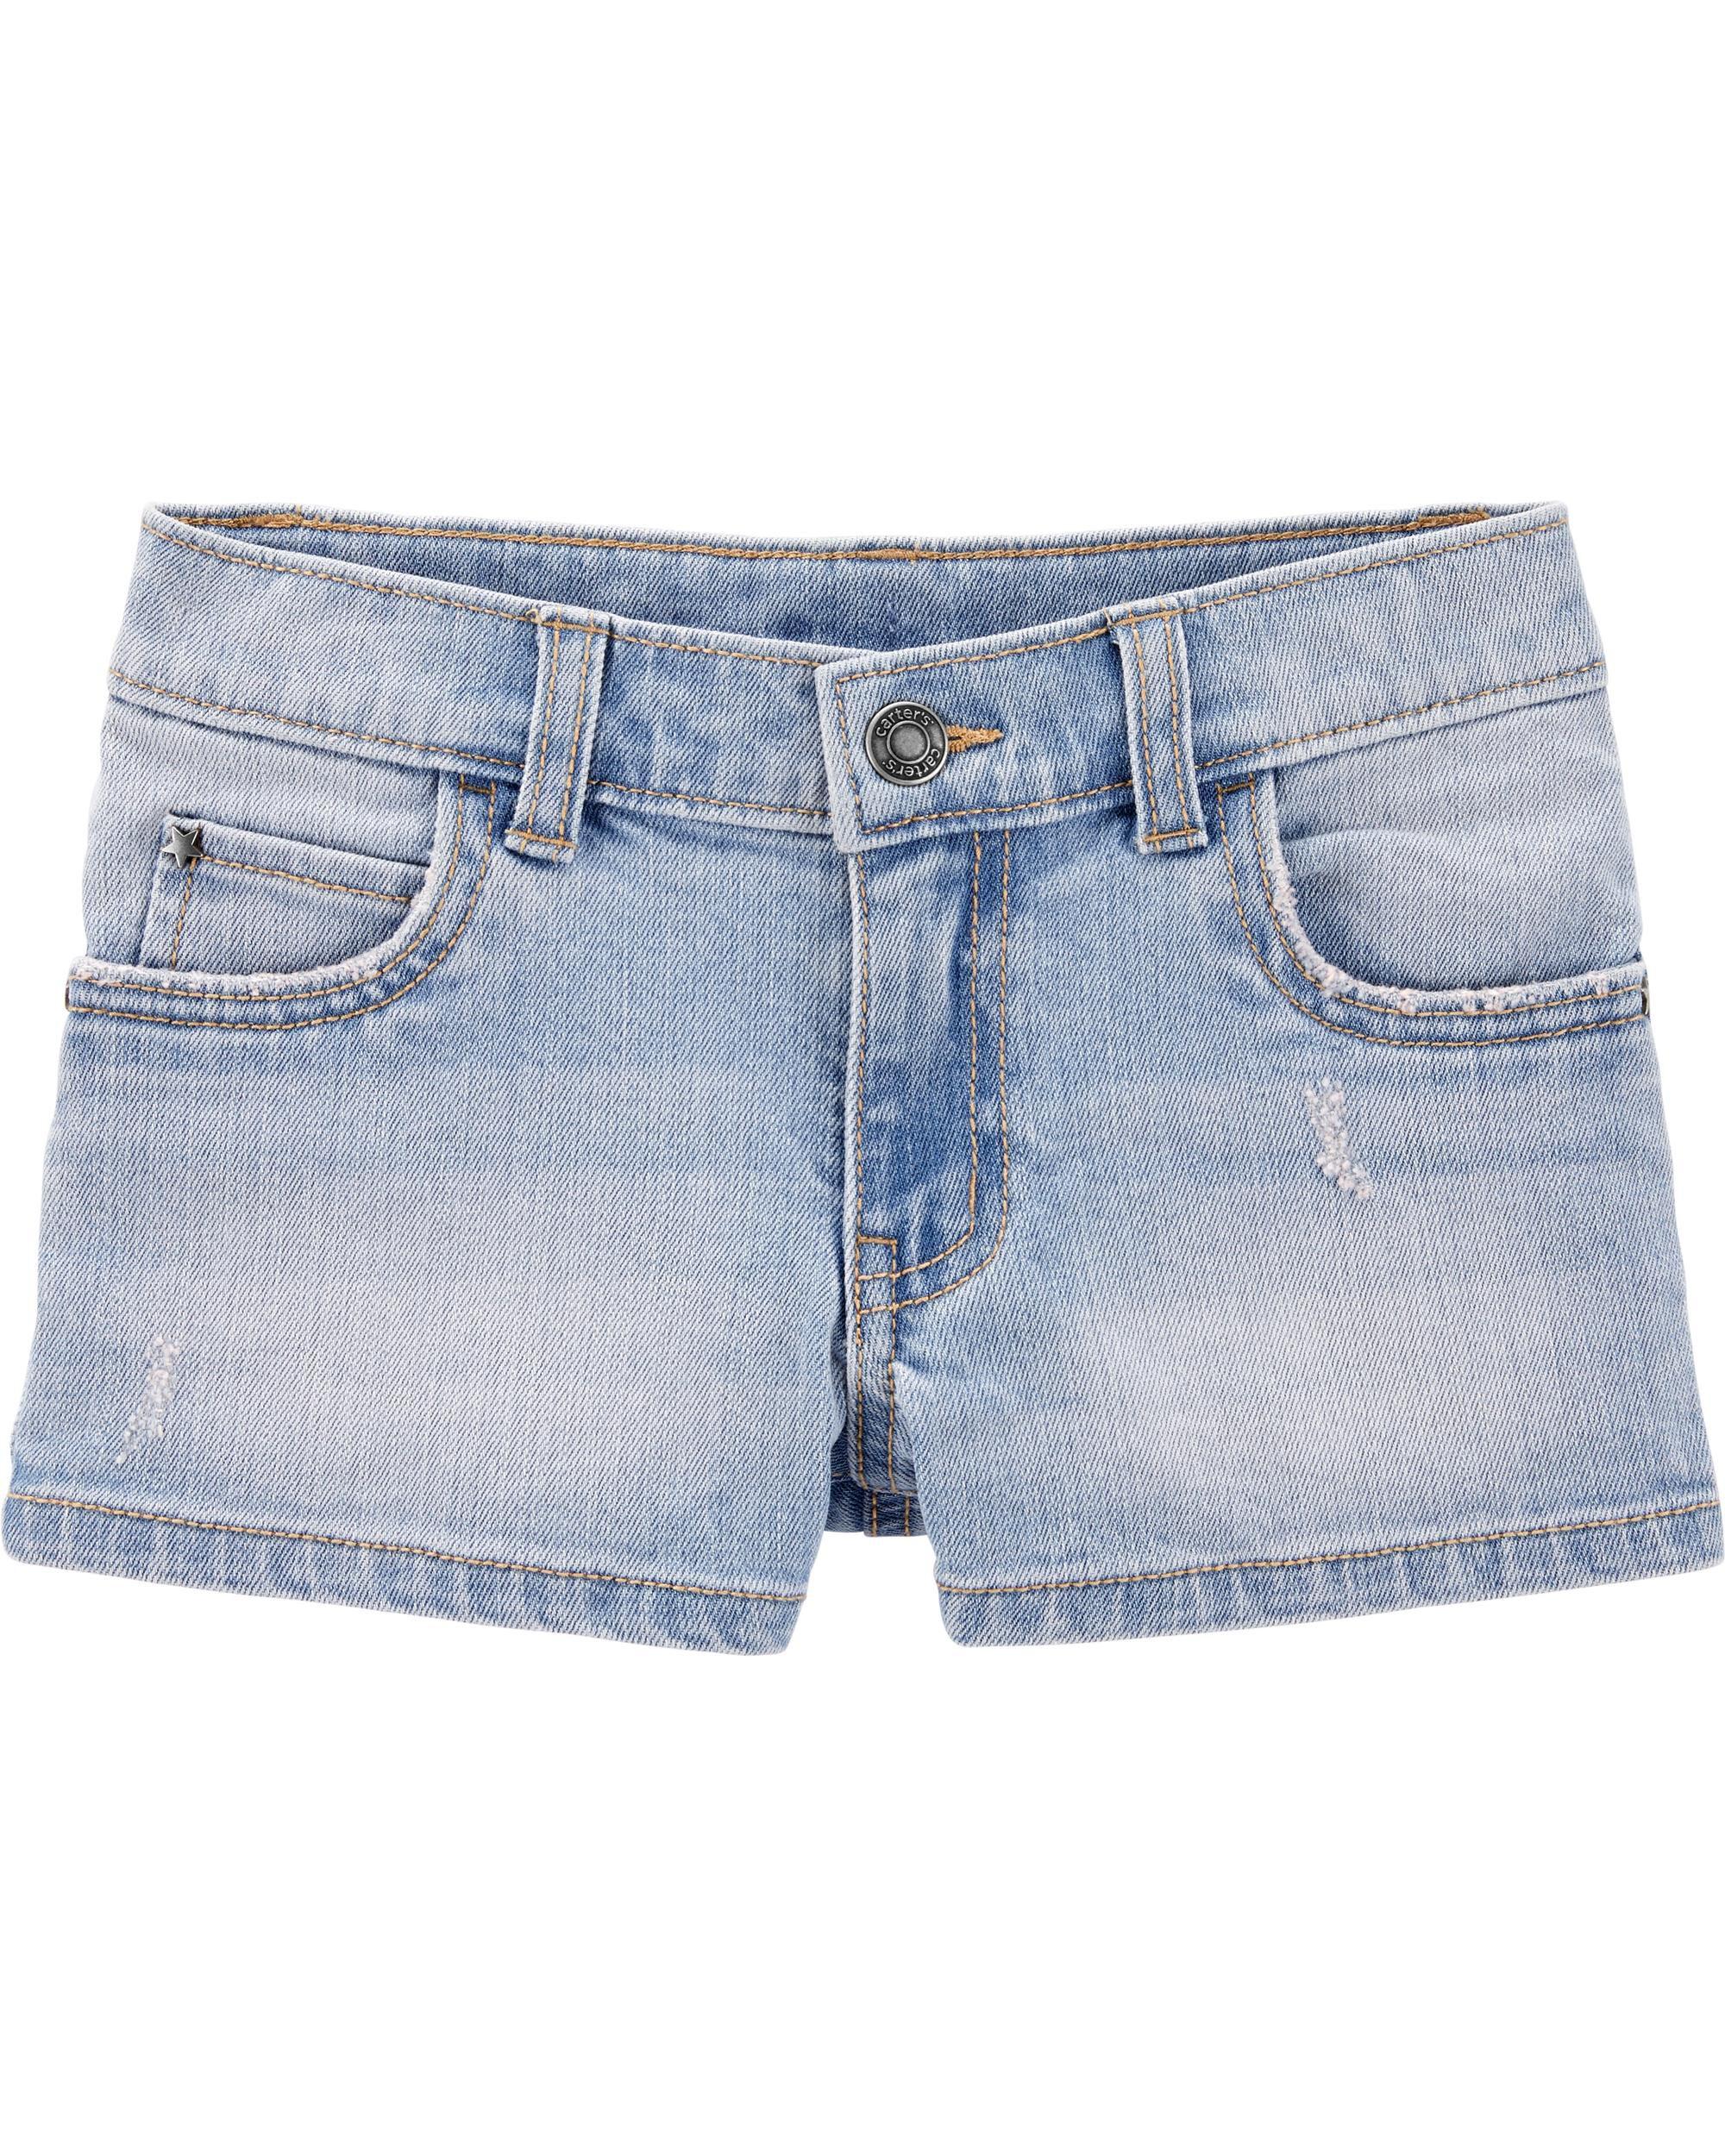 *Clearance*  Denim Shorts